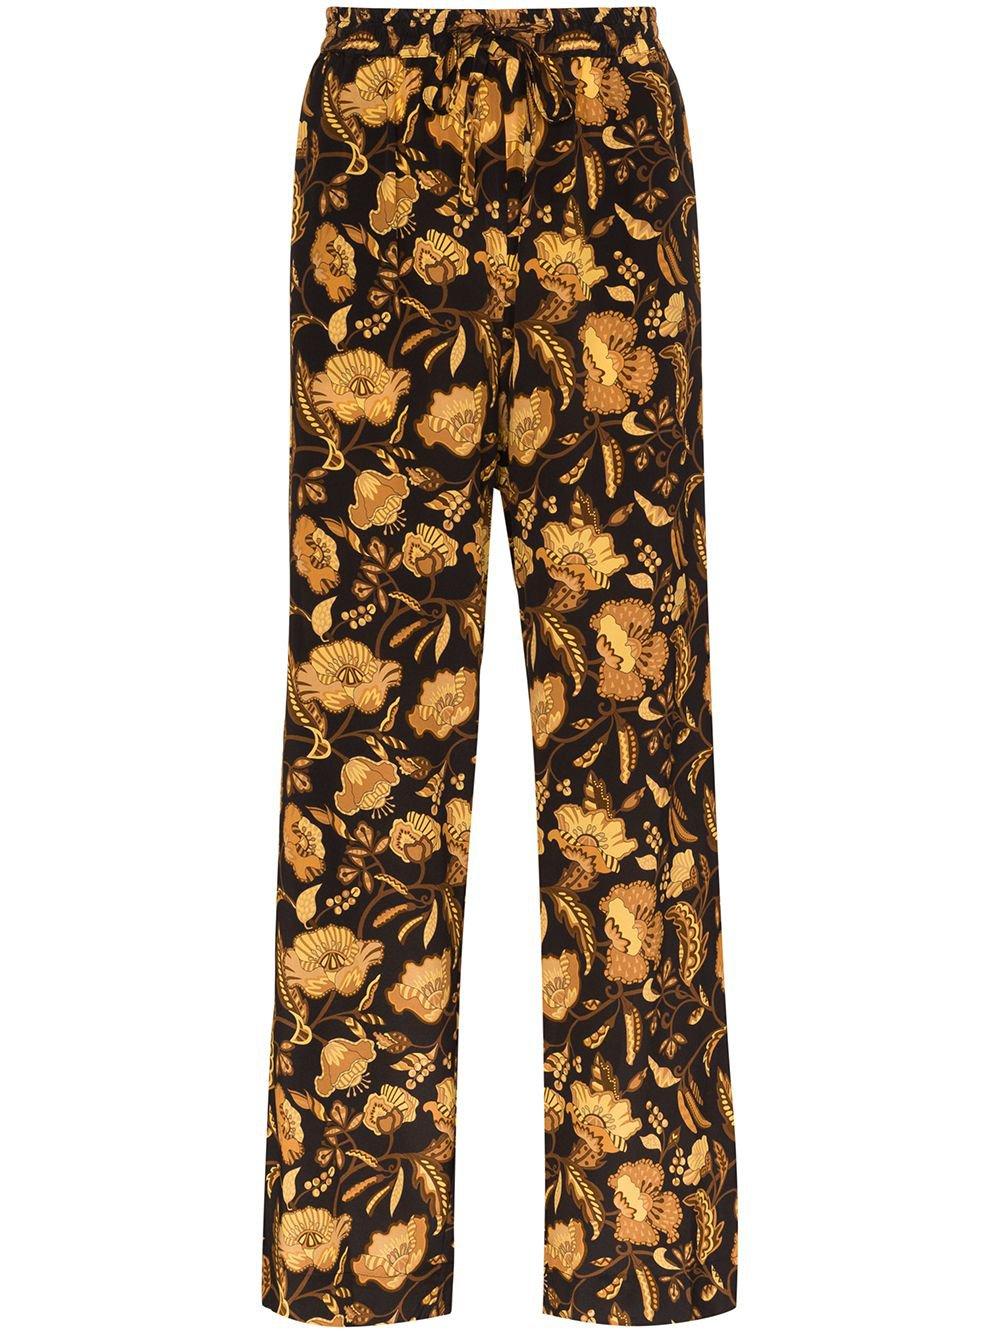 Black Matteau Floral Print Silk Trousers | Farfetch.com